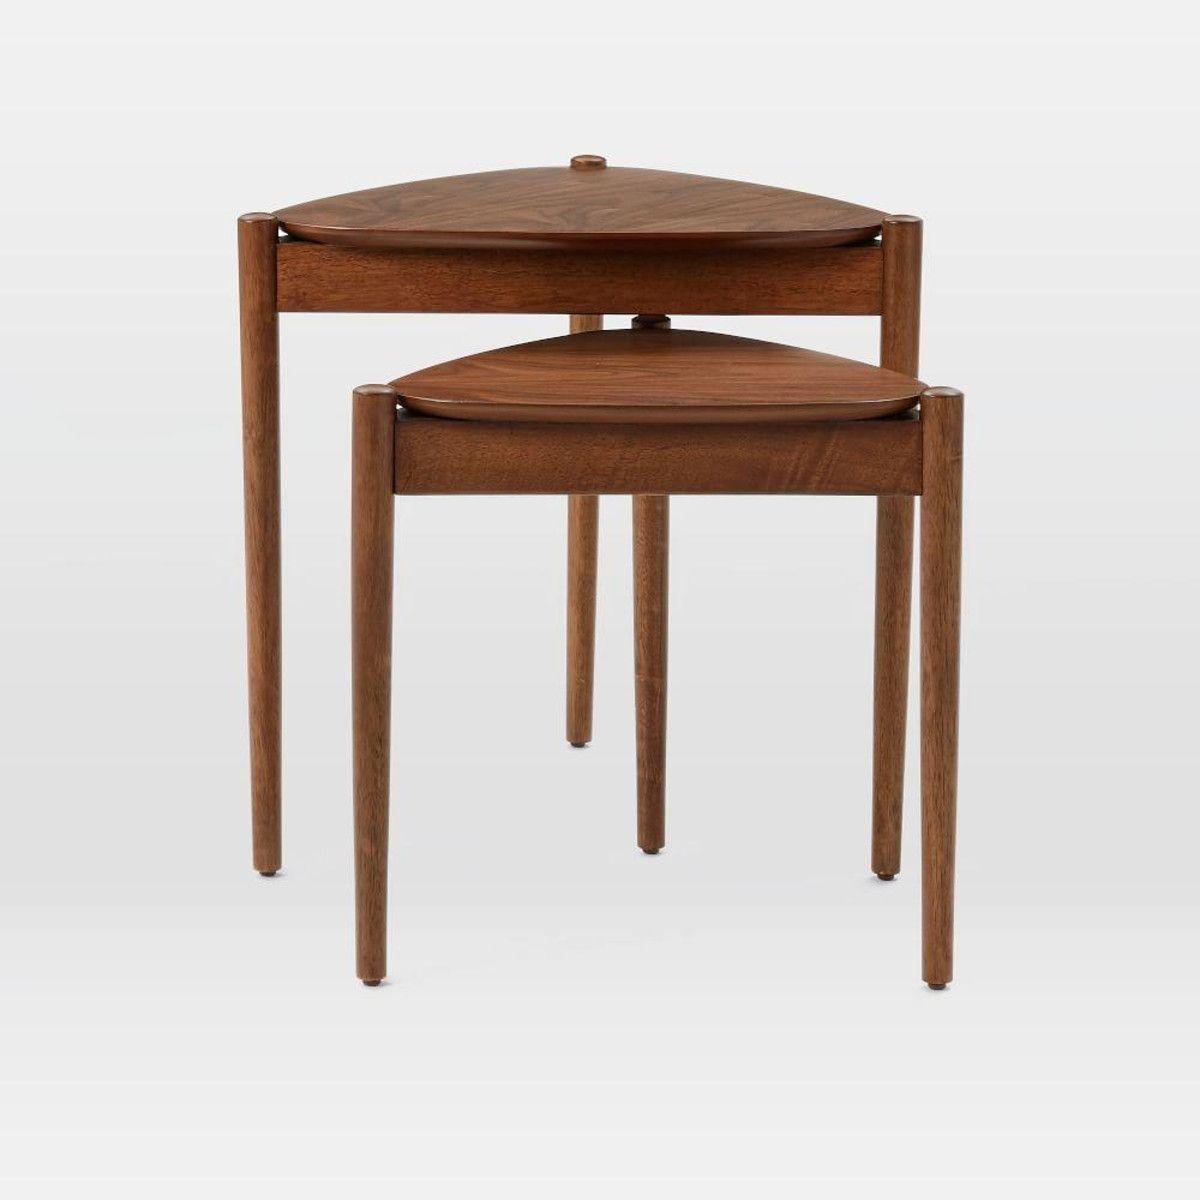 Retro Tripod Nesting Tables   Furniture   Pinterest   Tripod, Retro ...